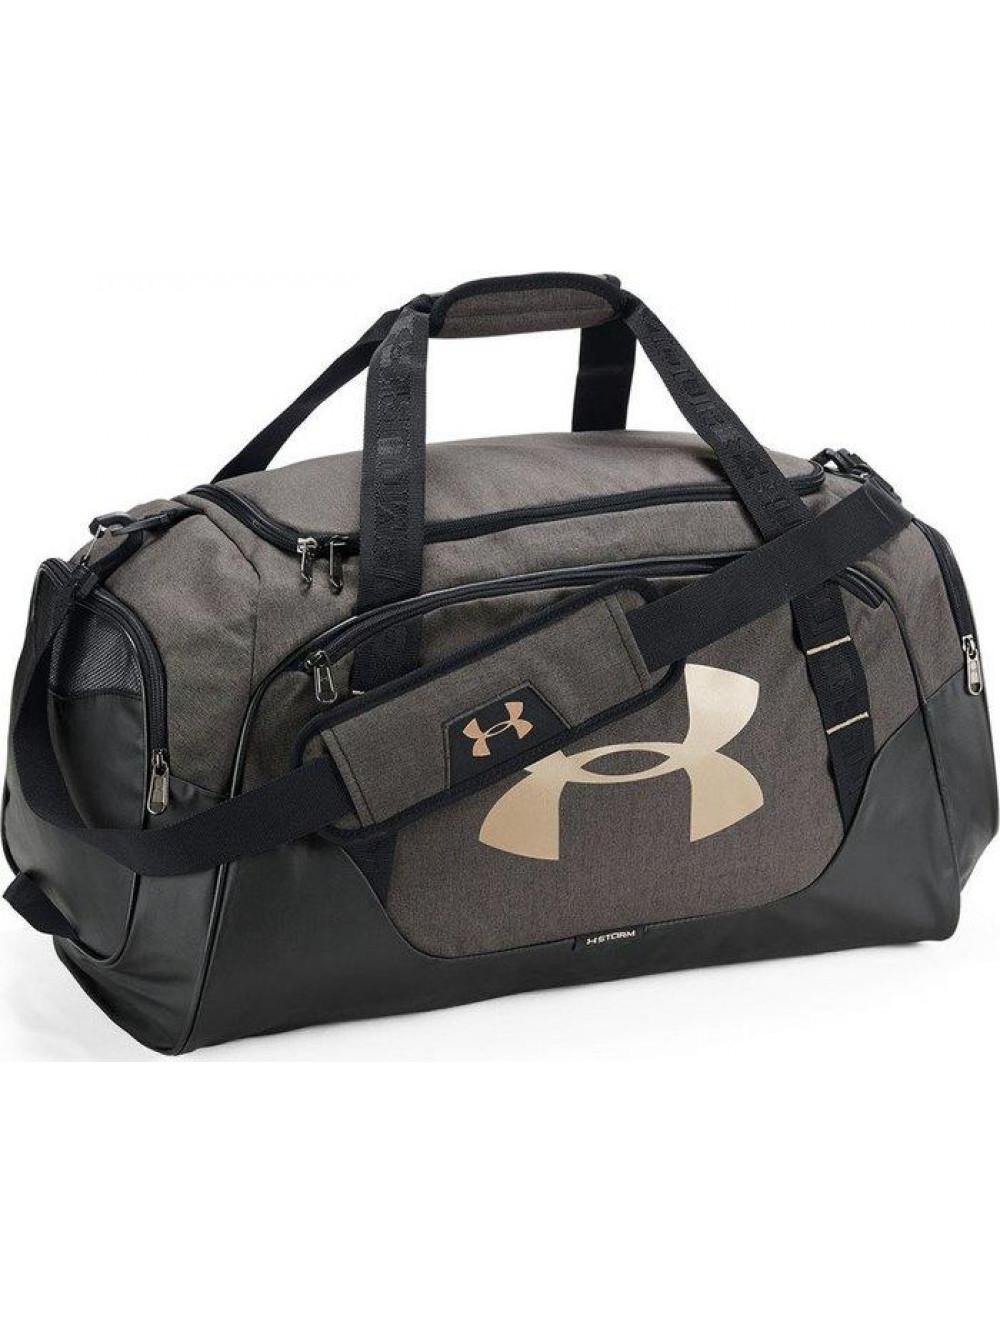 Športová taška Under Armour Undeniable Duffel sivá